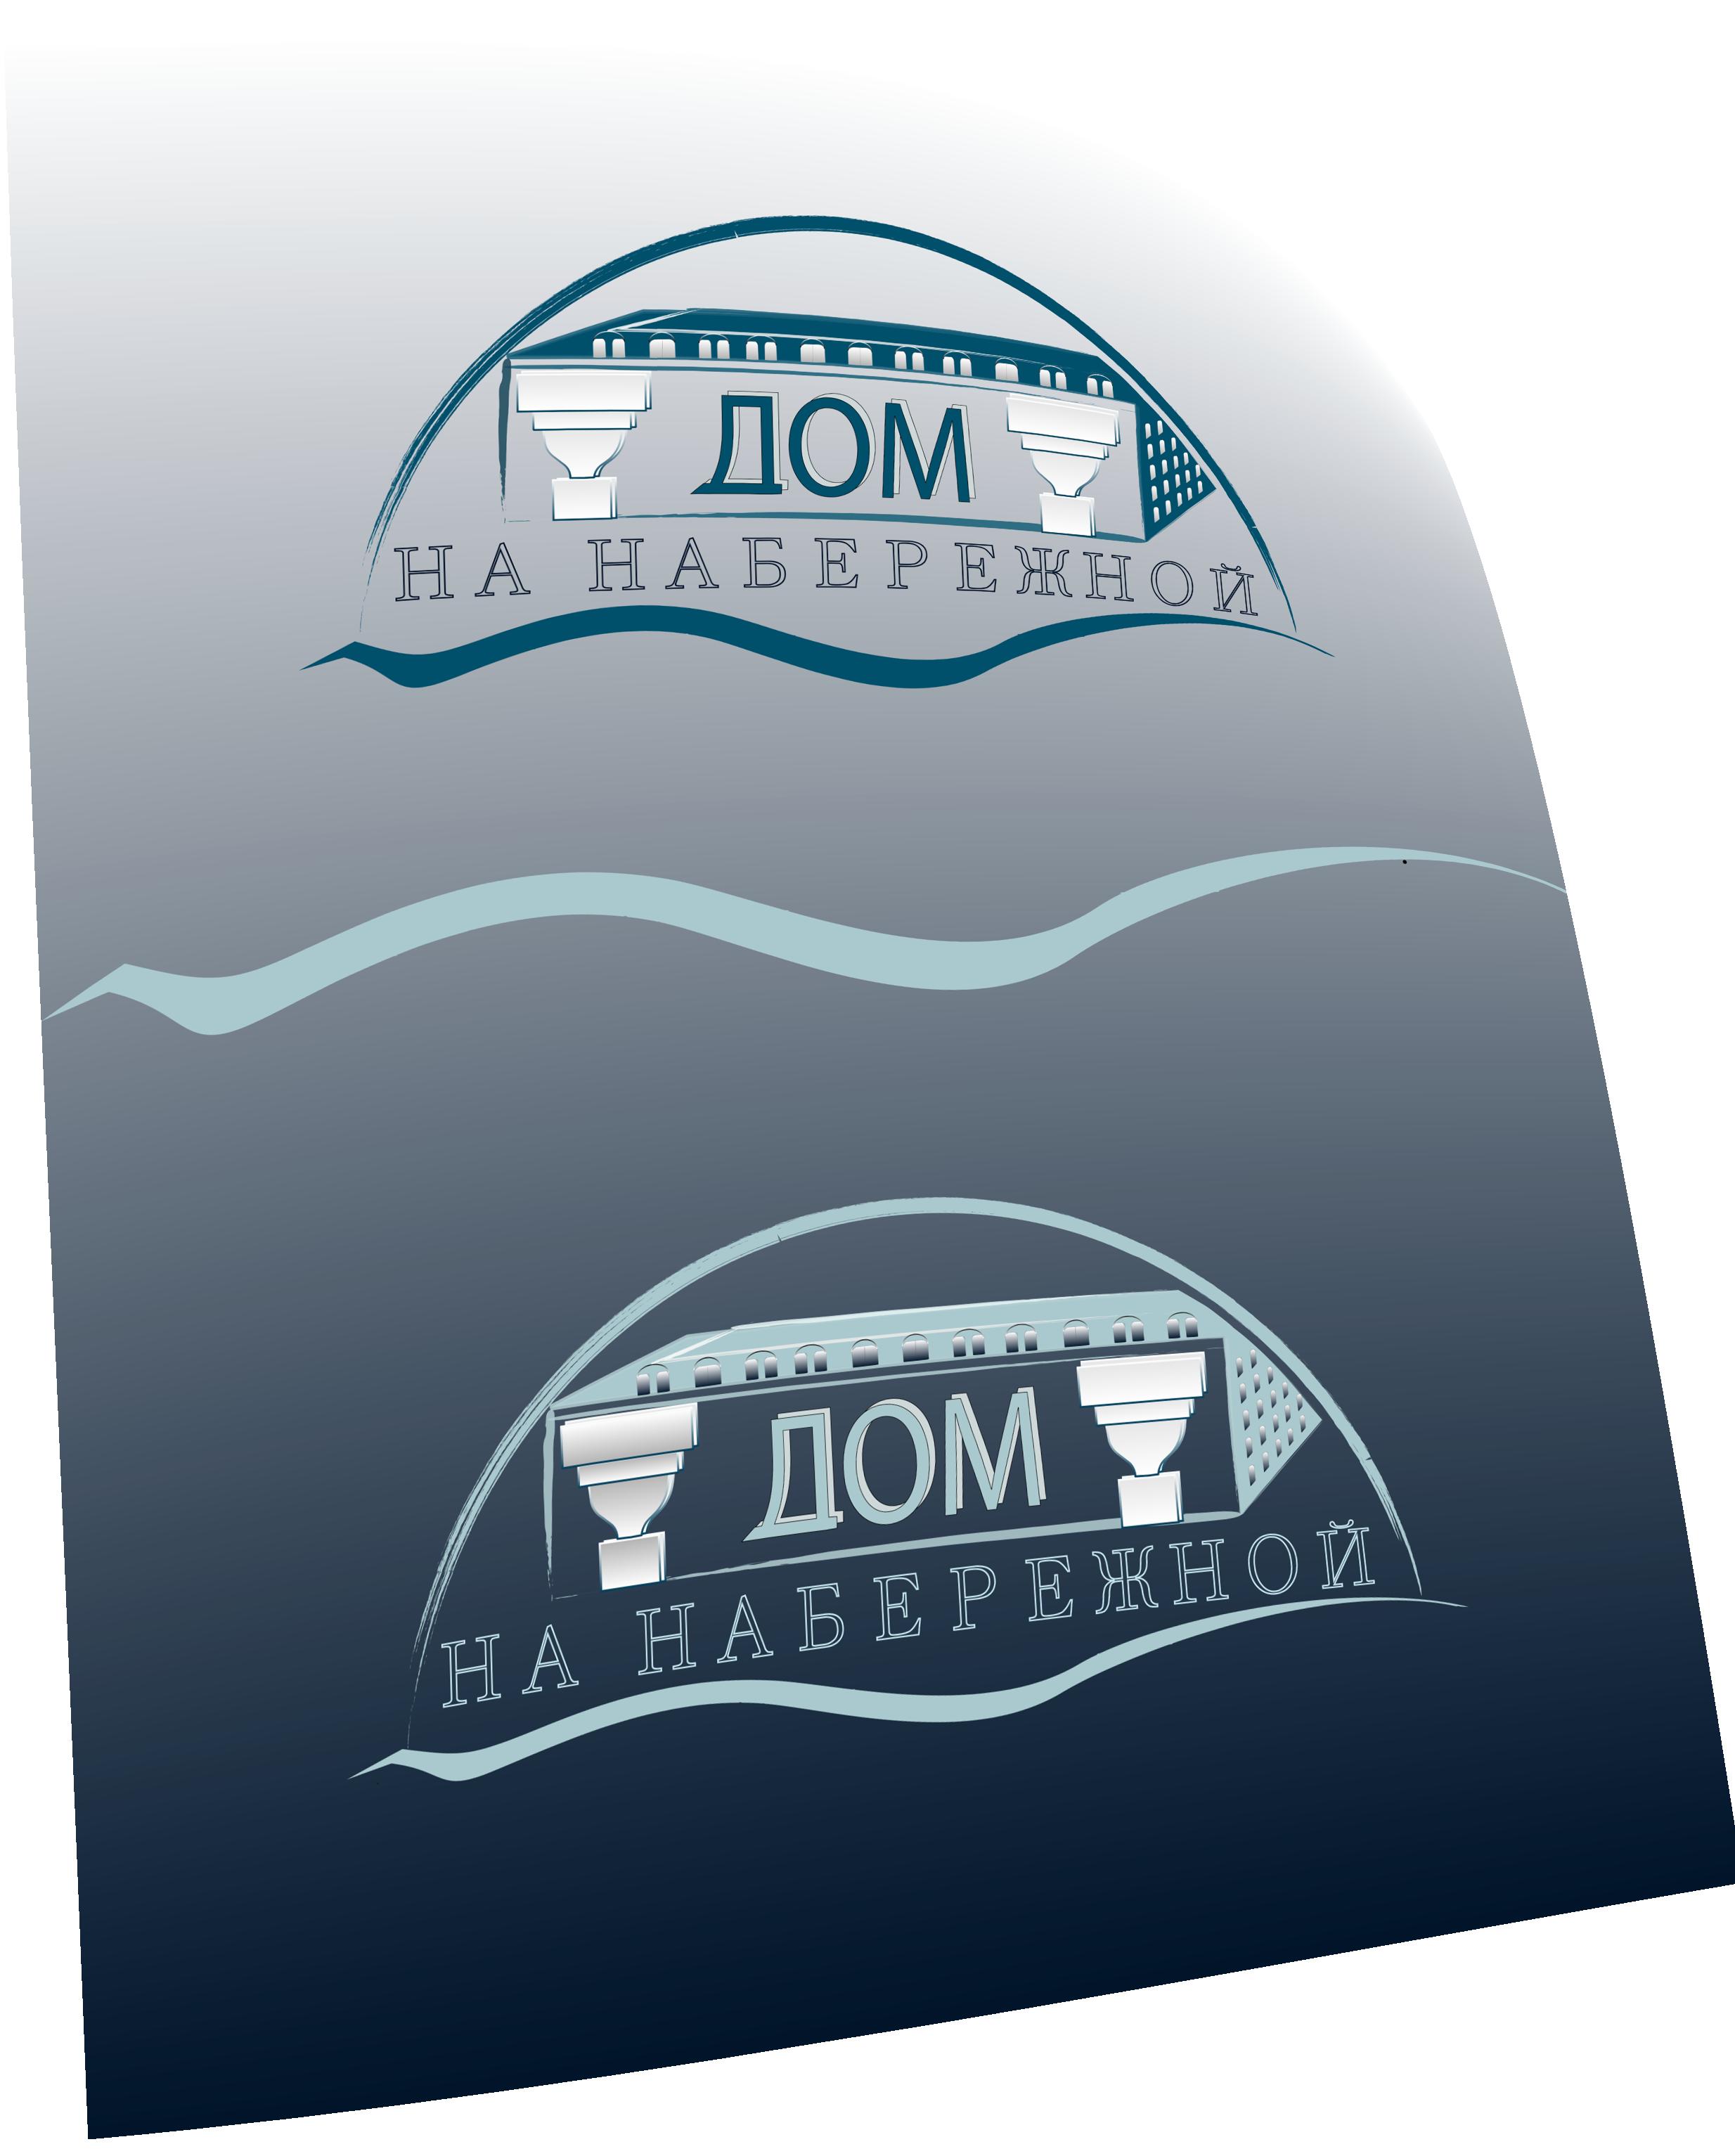 РАЗРАБОТКА логотипа для ЖИЛОГО КОМПЛЕКСА премиум В АНАПЕ.  фото f_0235dedf6f7bc047.png